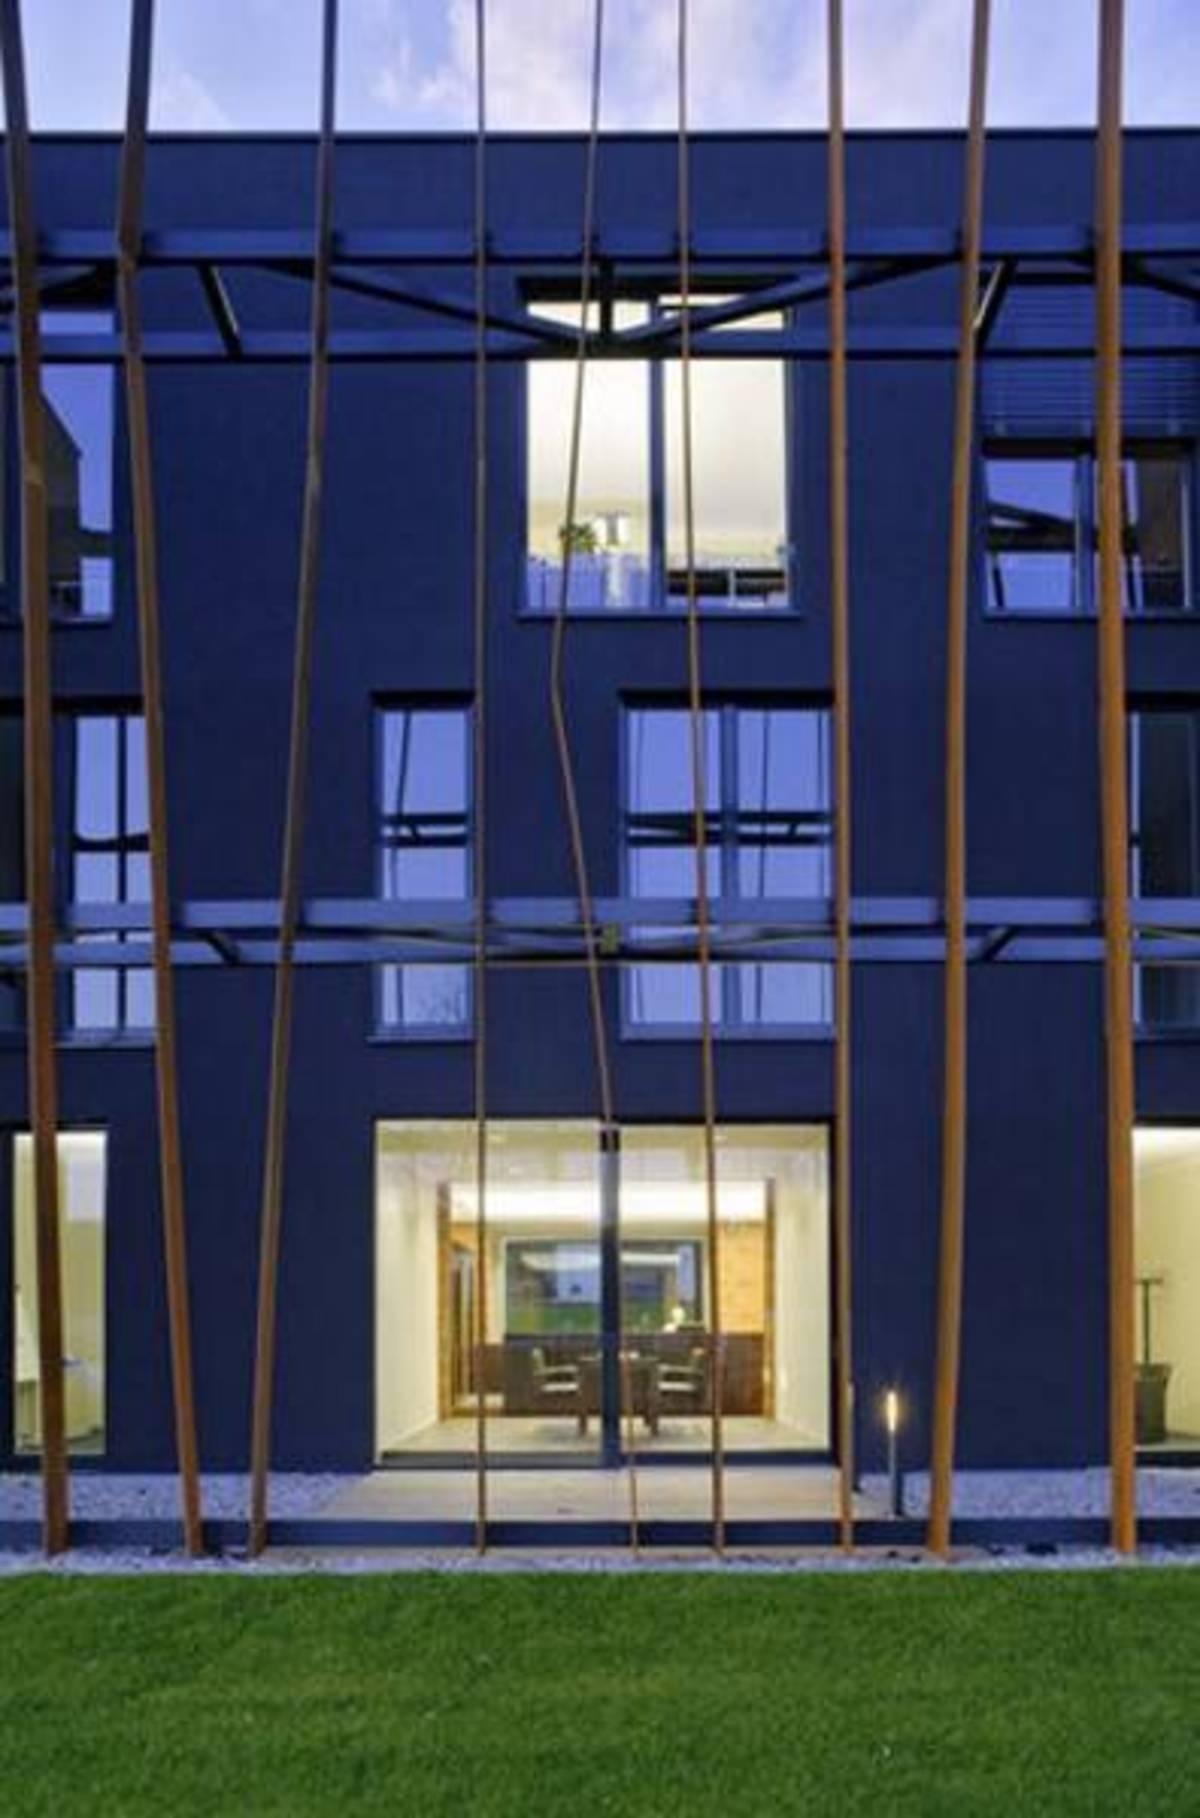 Hertl architekten hofmeister buro austria floornature - Buro 13 architekten ...